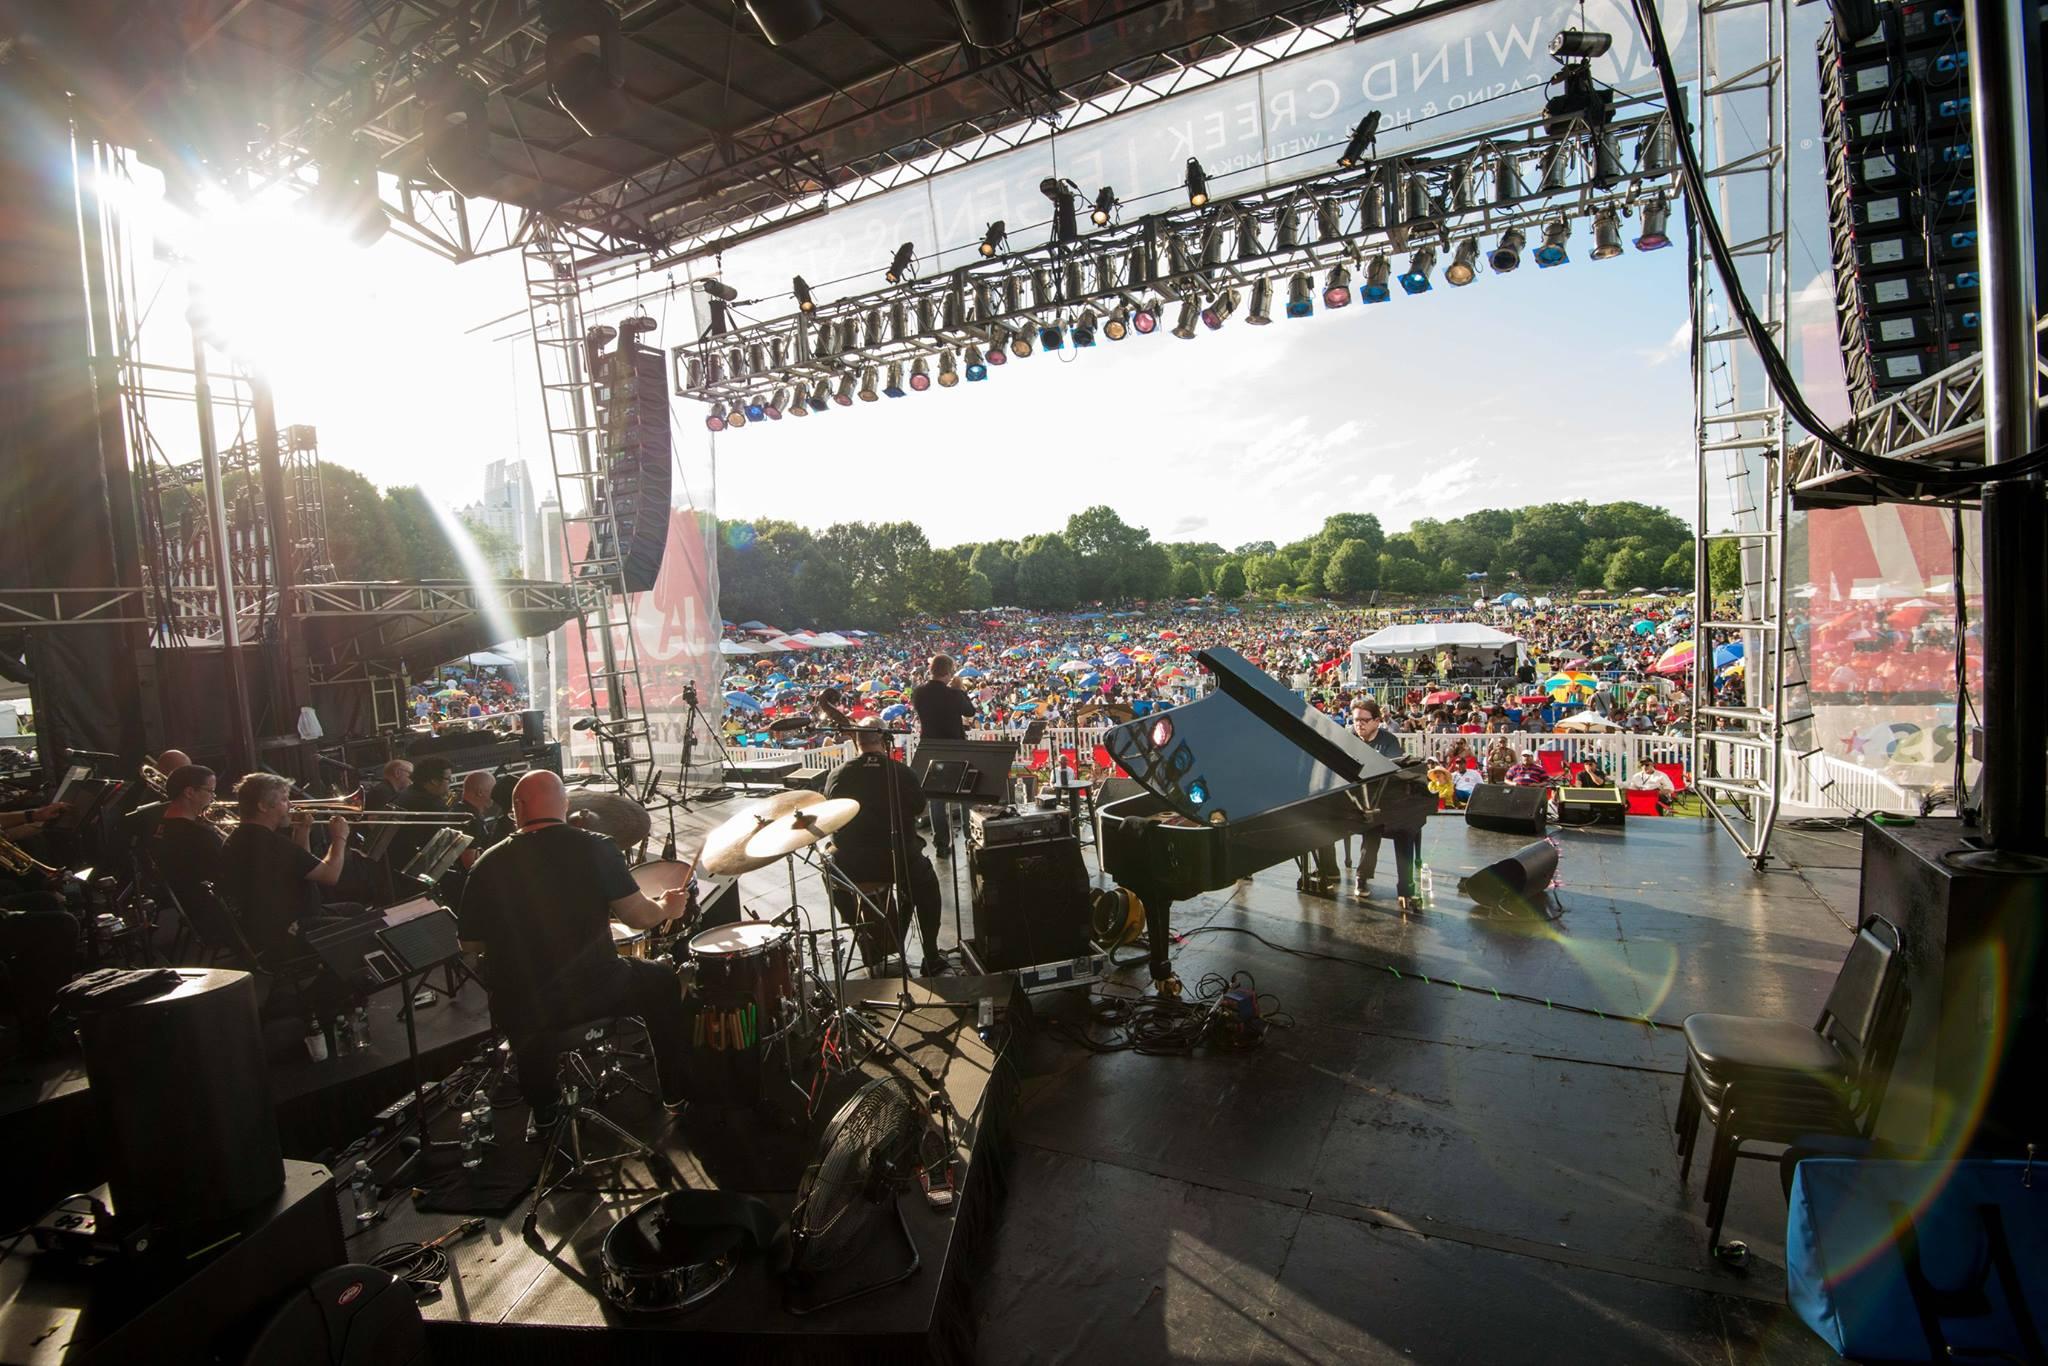 Atlanta Jazz Festival 2020 Lineup.City Of Atlanta Mayor S Office Of Cultural Affairs